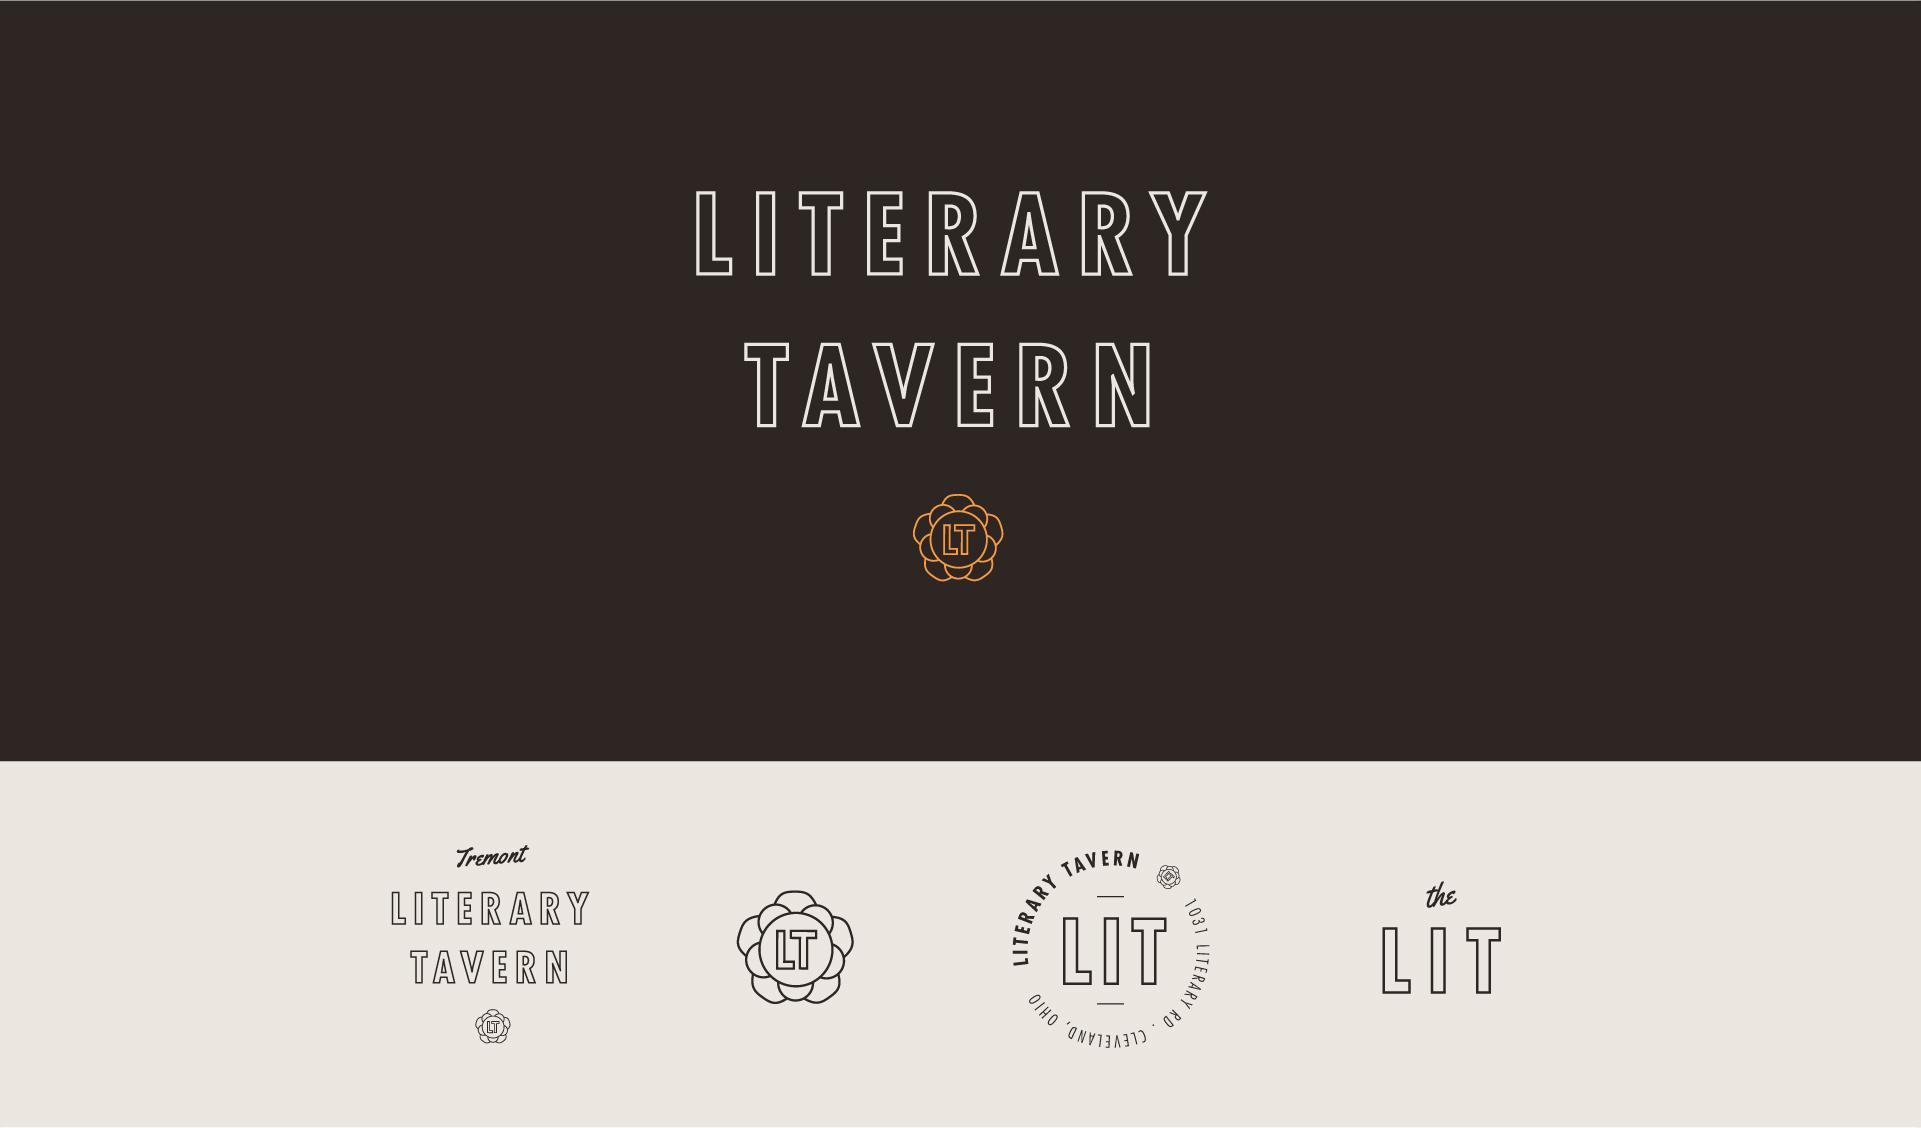 Literary-Tavern